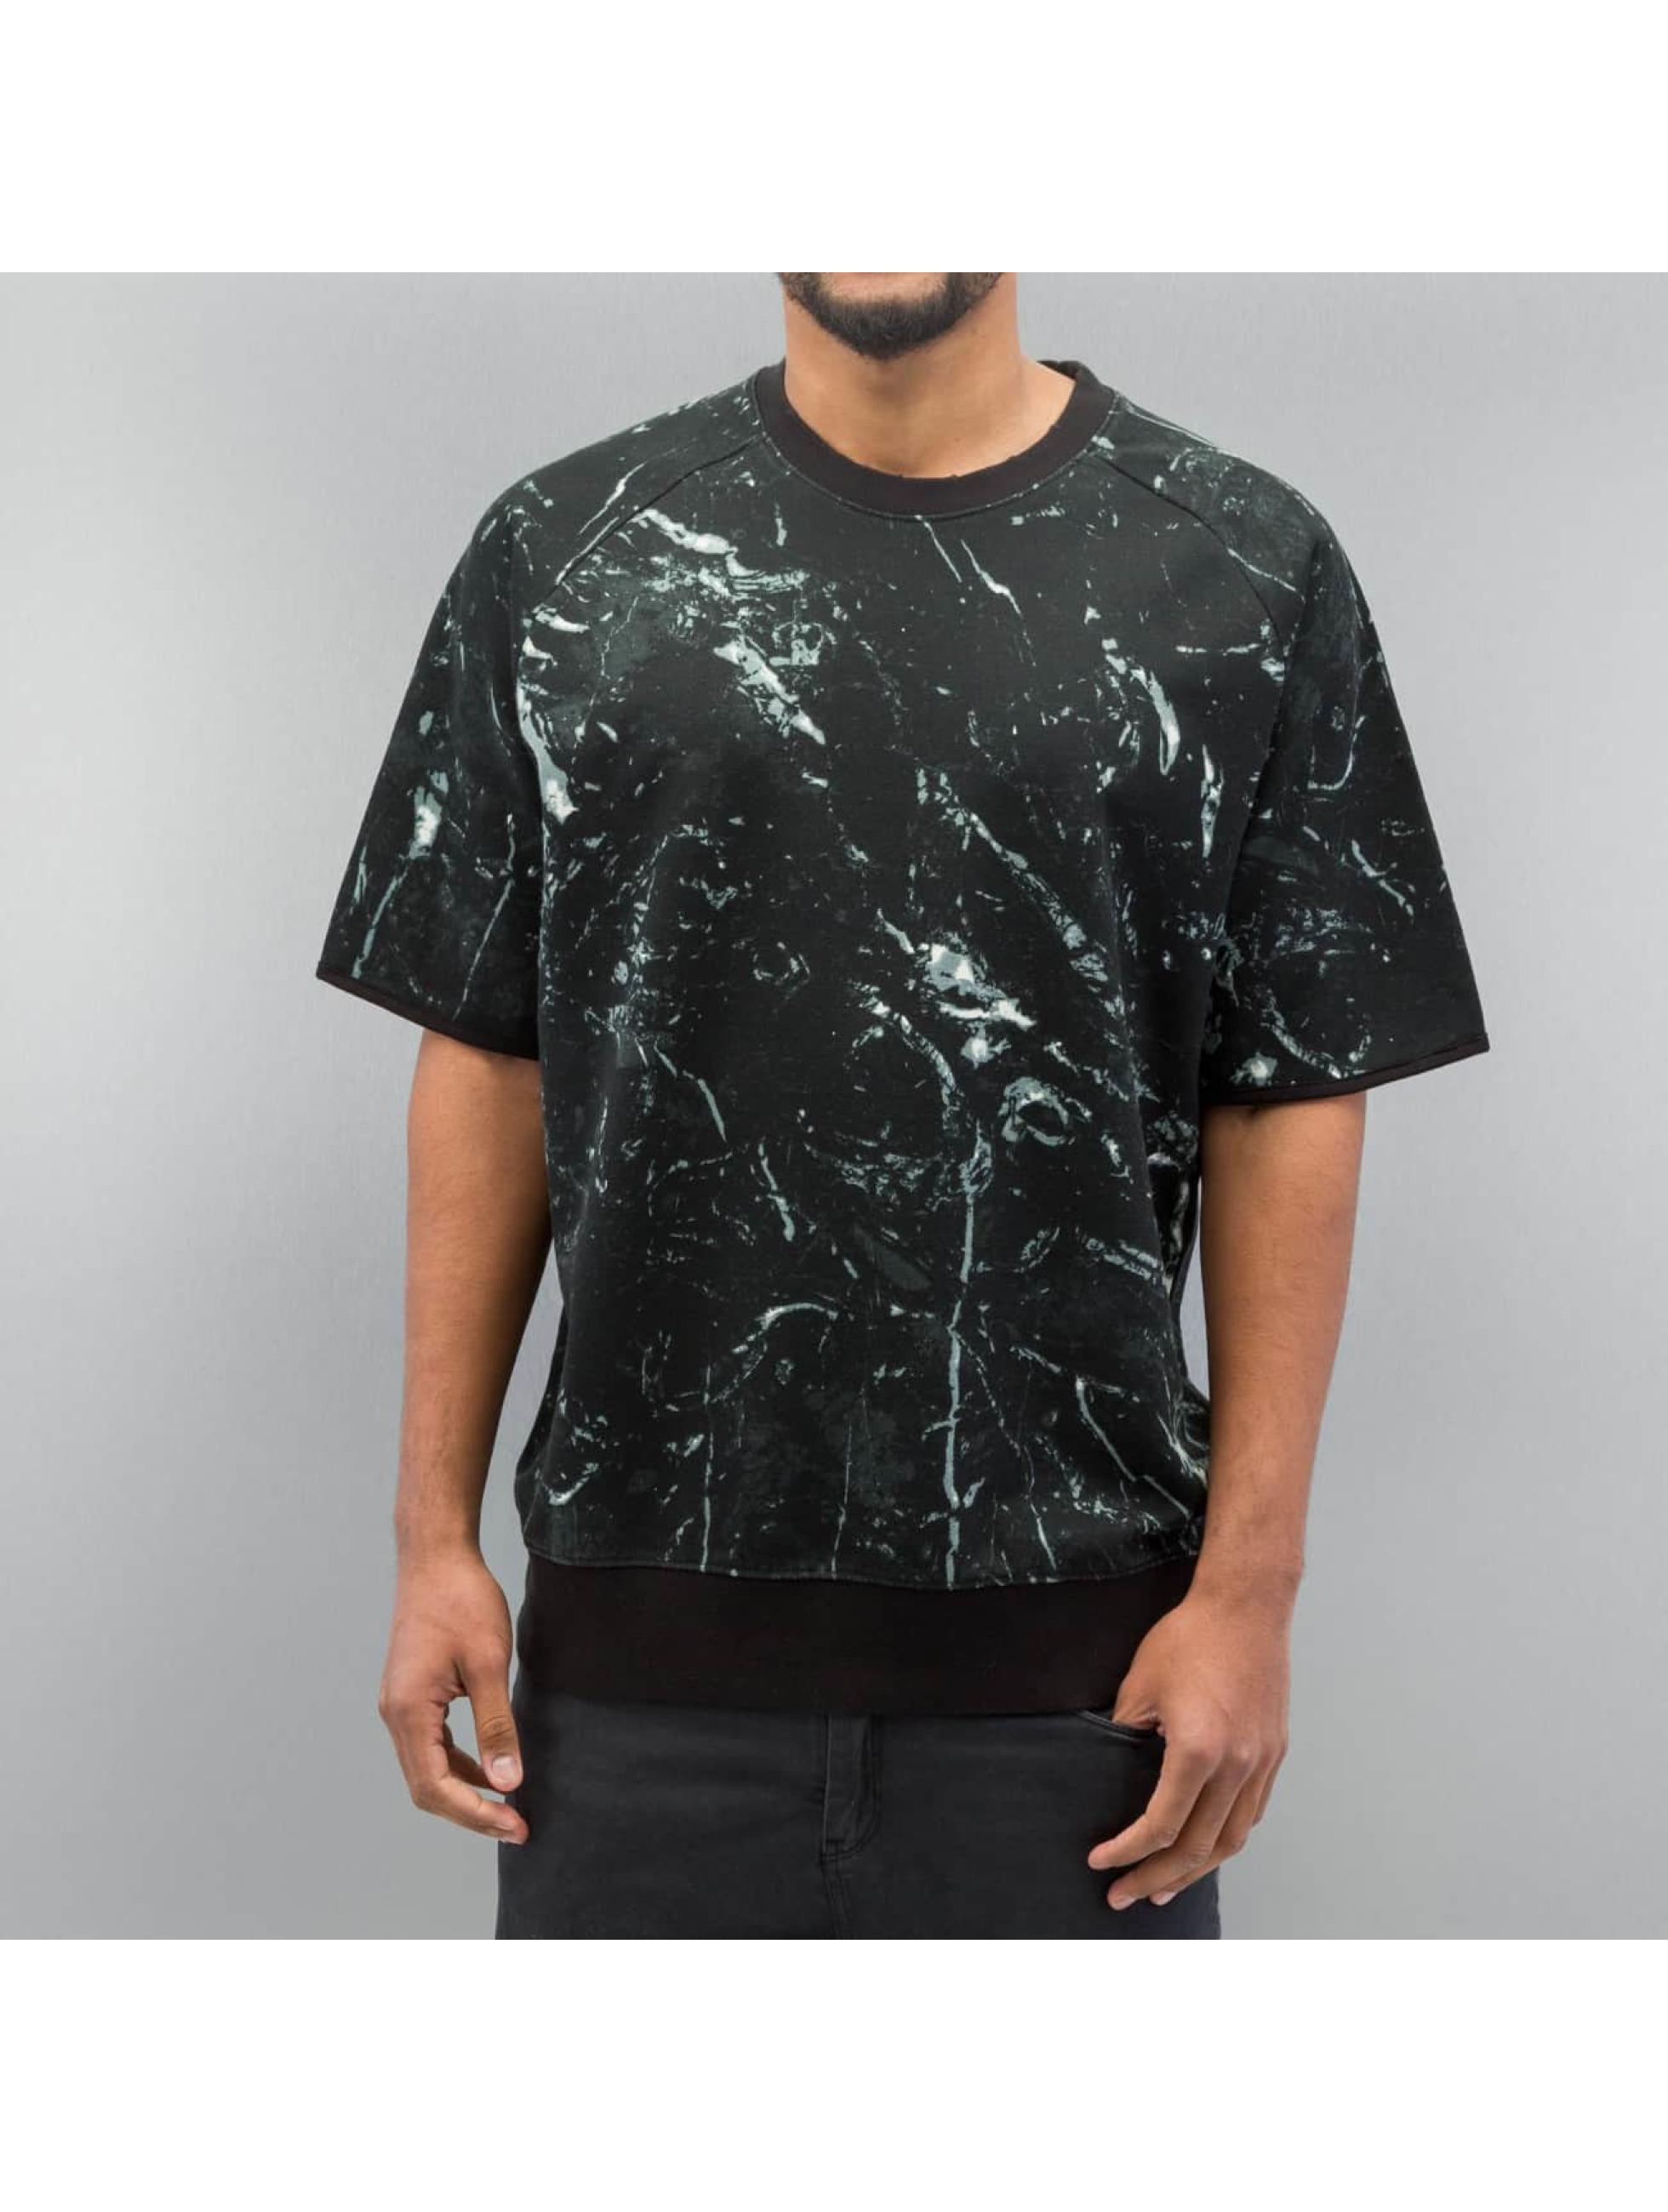 SHINE Original trui Short Sleeve zwart